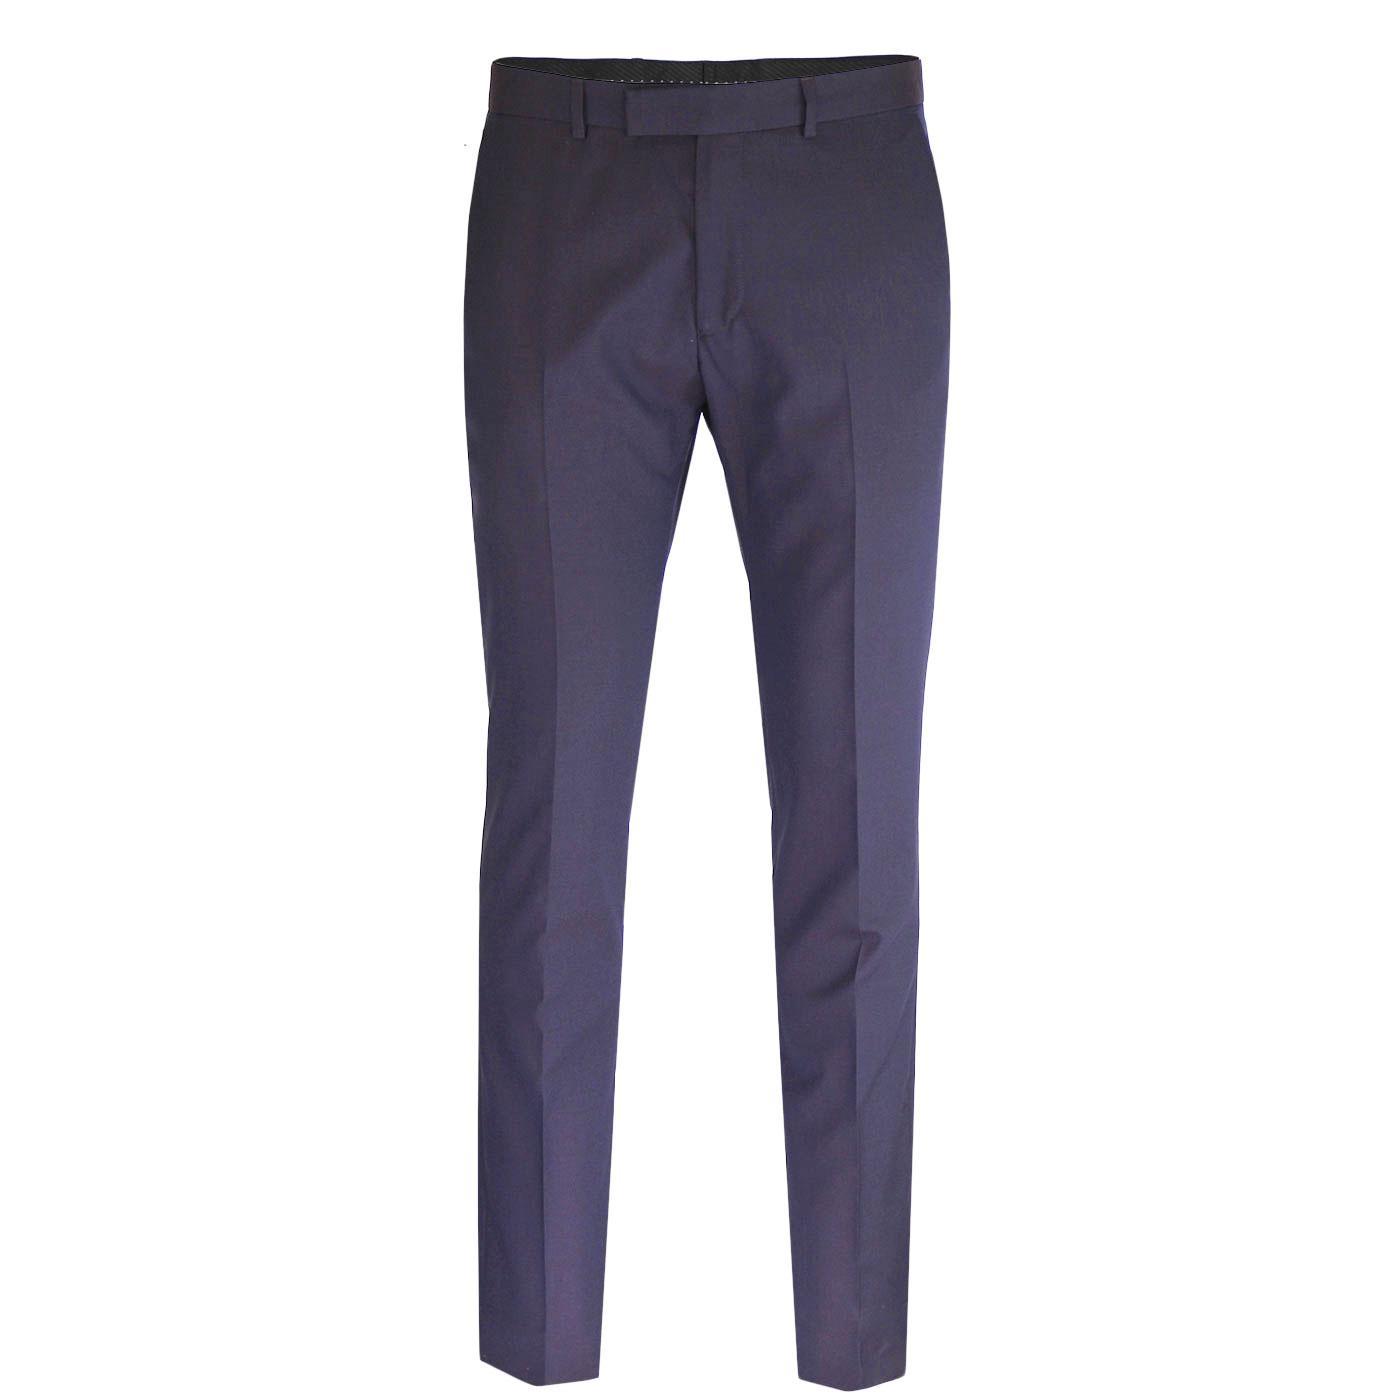 BEN SHERMAN Tailoring Mod Tonic Suit Trousers (A)